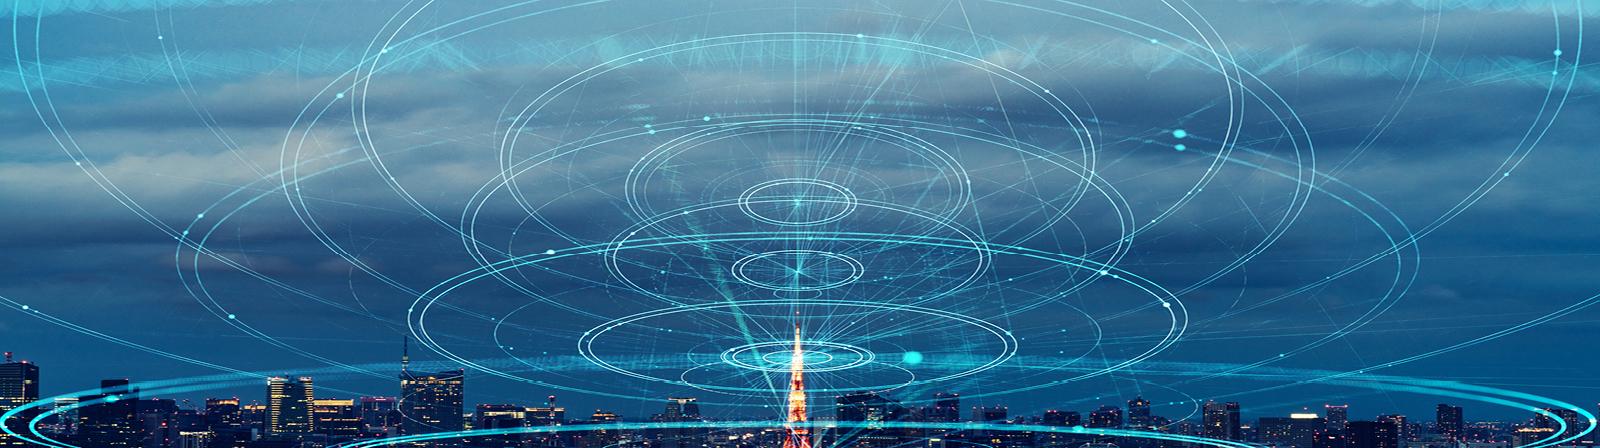 20-Calendar-UTC Webinar Outdoor Radio Propagation